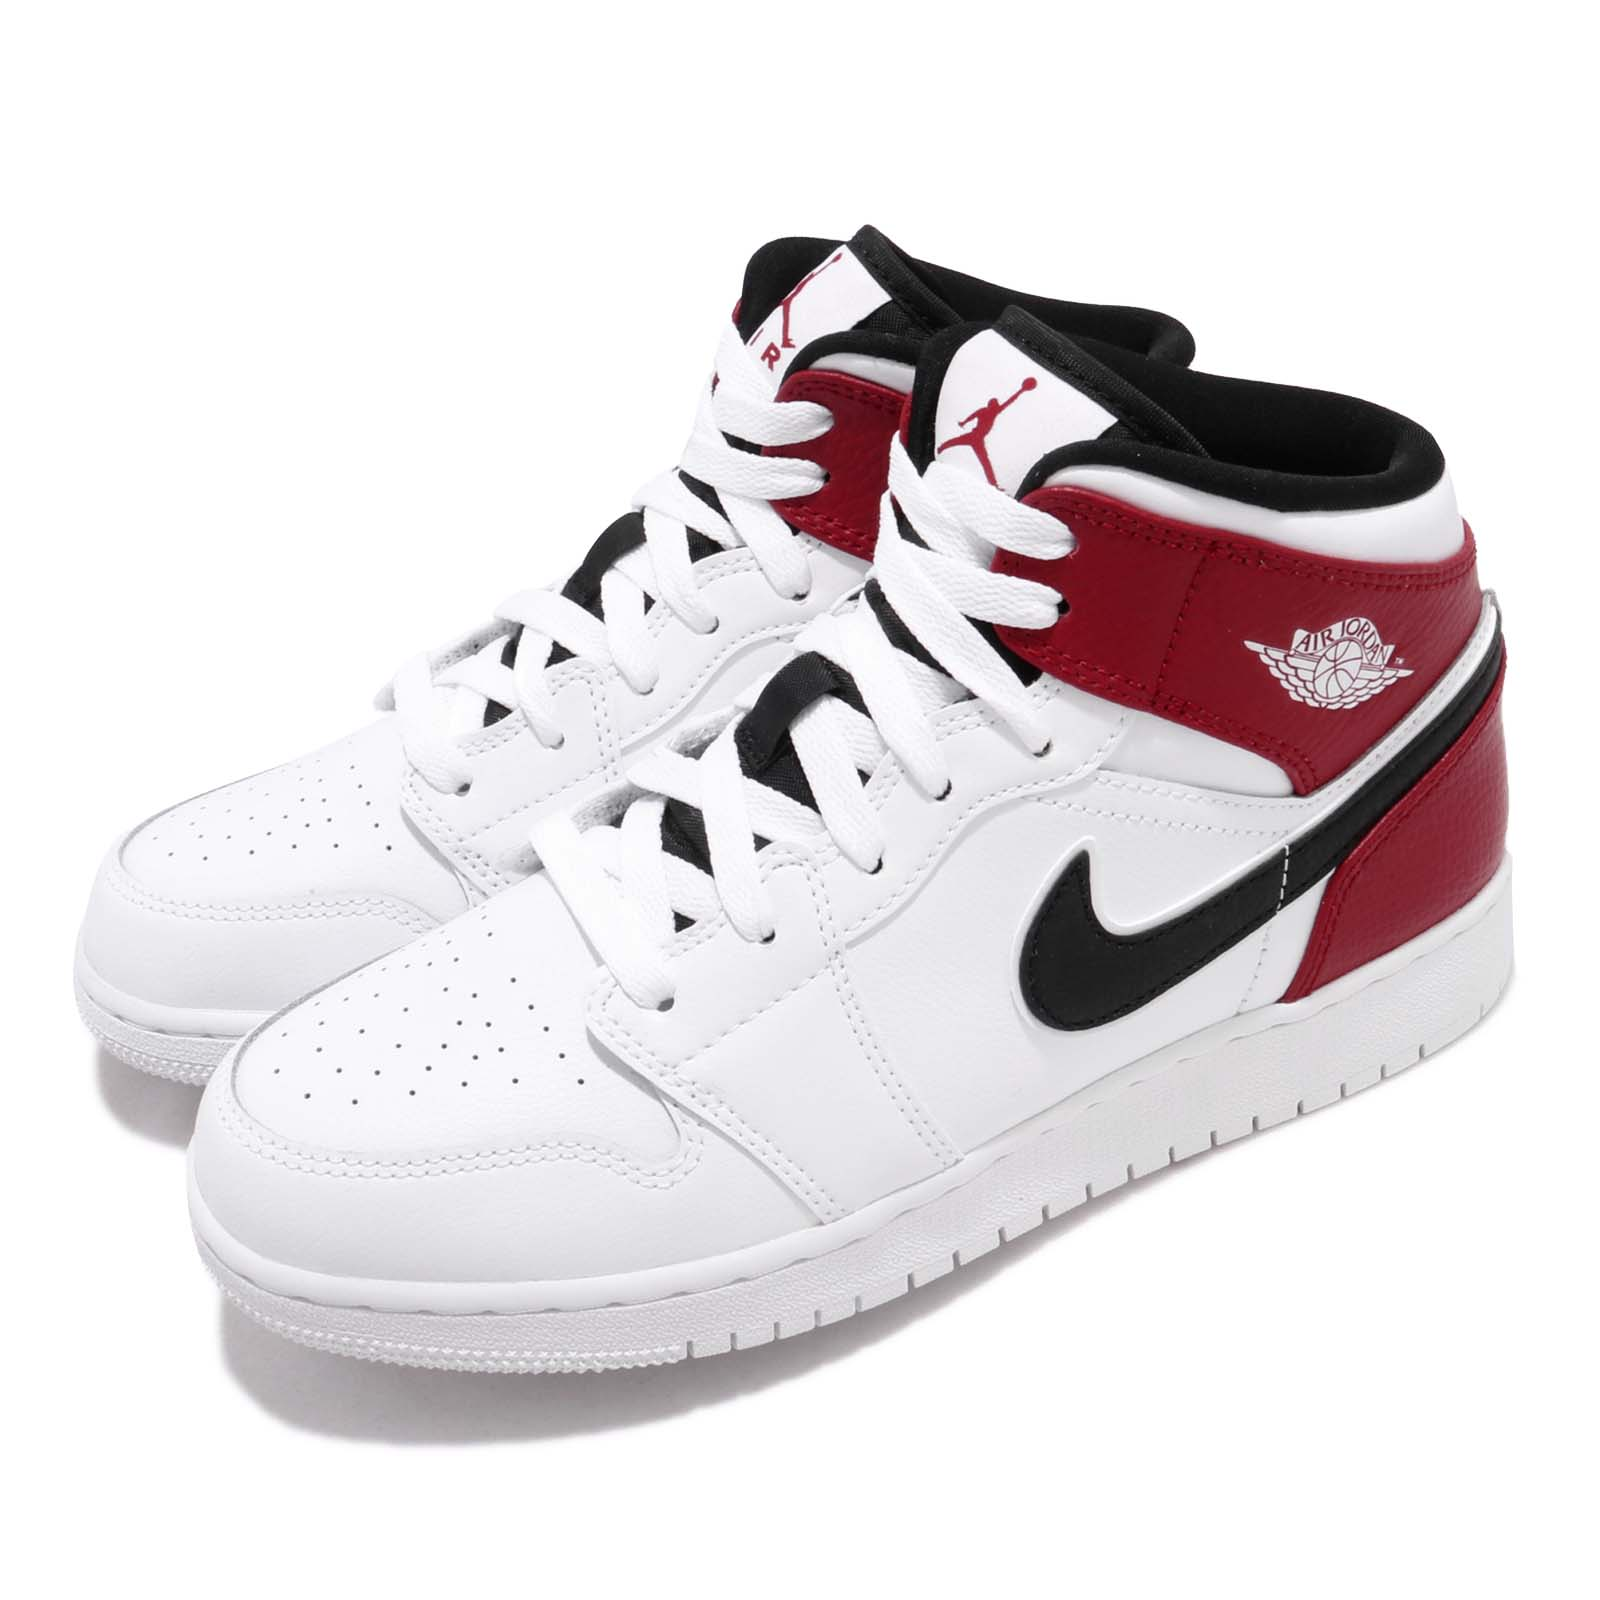 Nike Air Jordan 1 GS 女鞋 554725-116